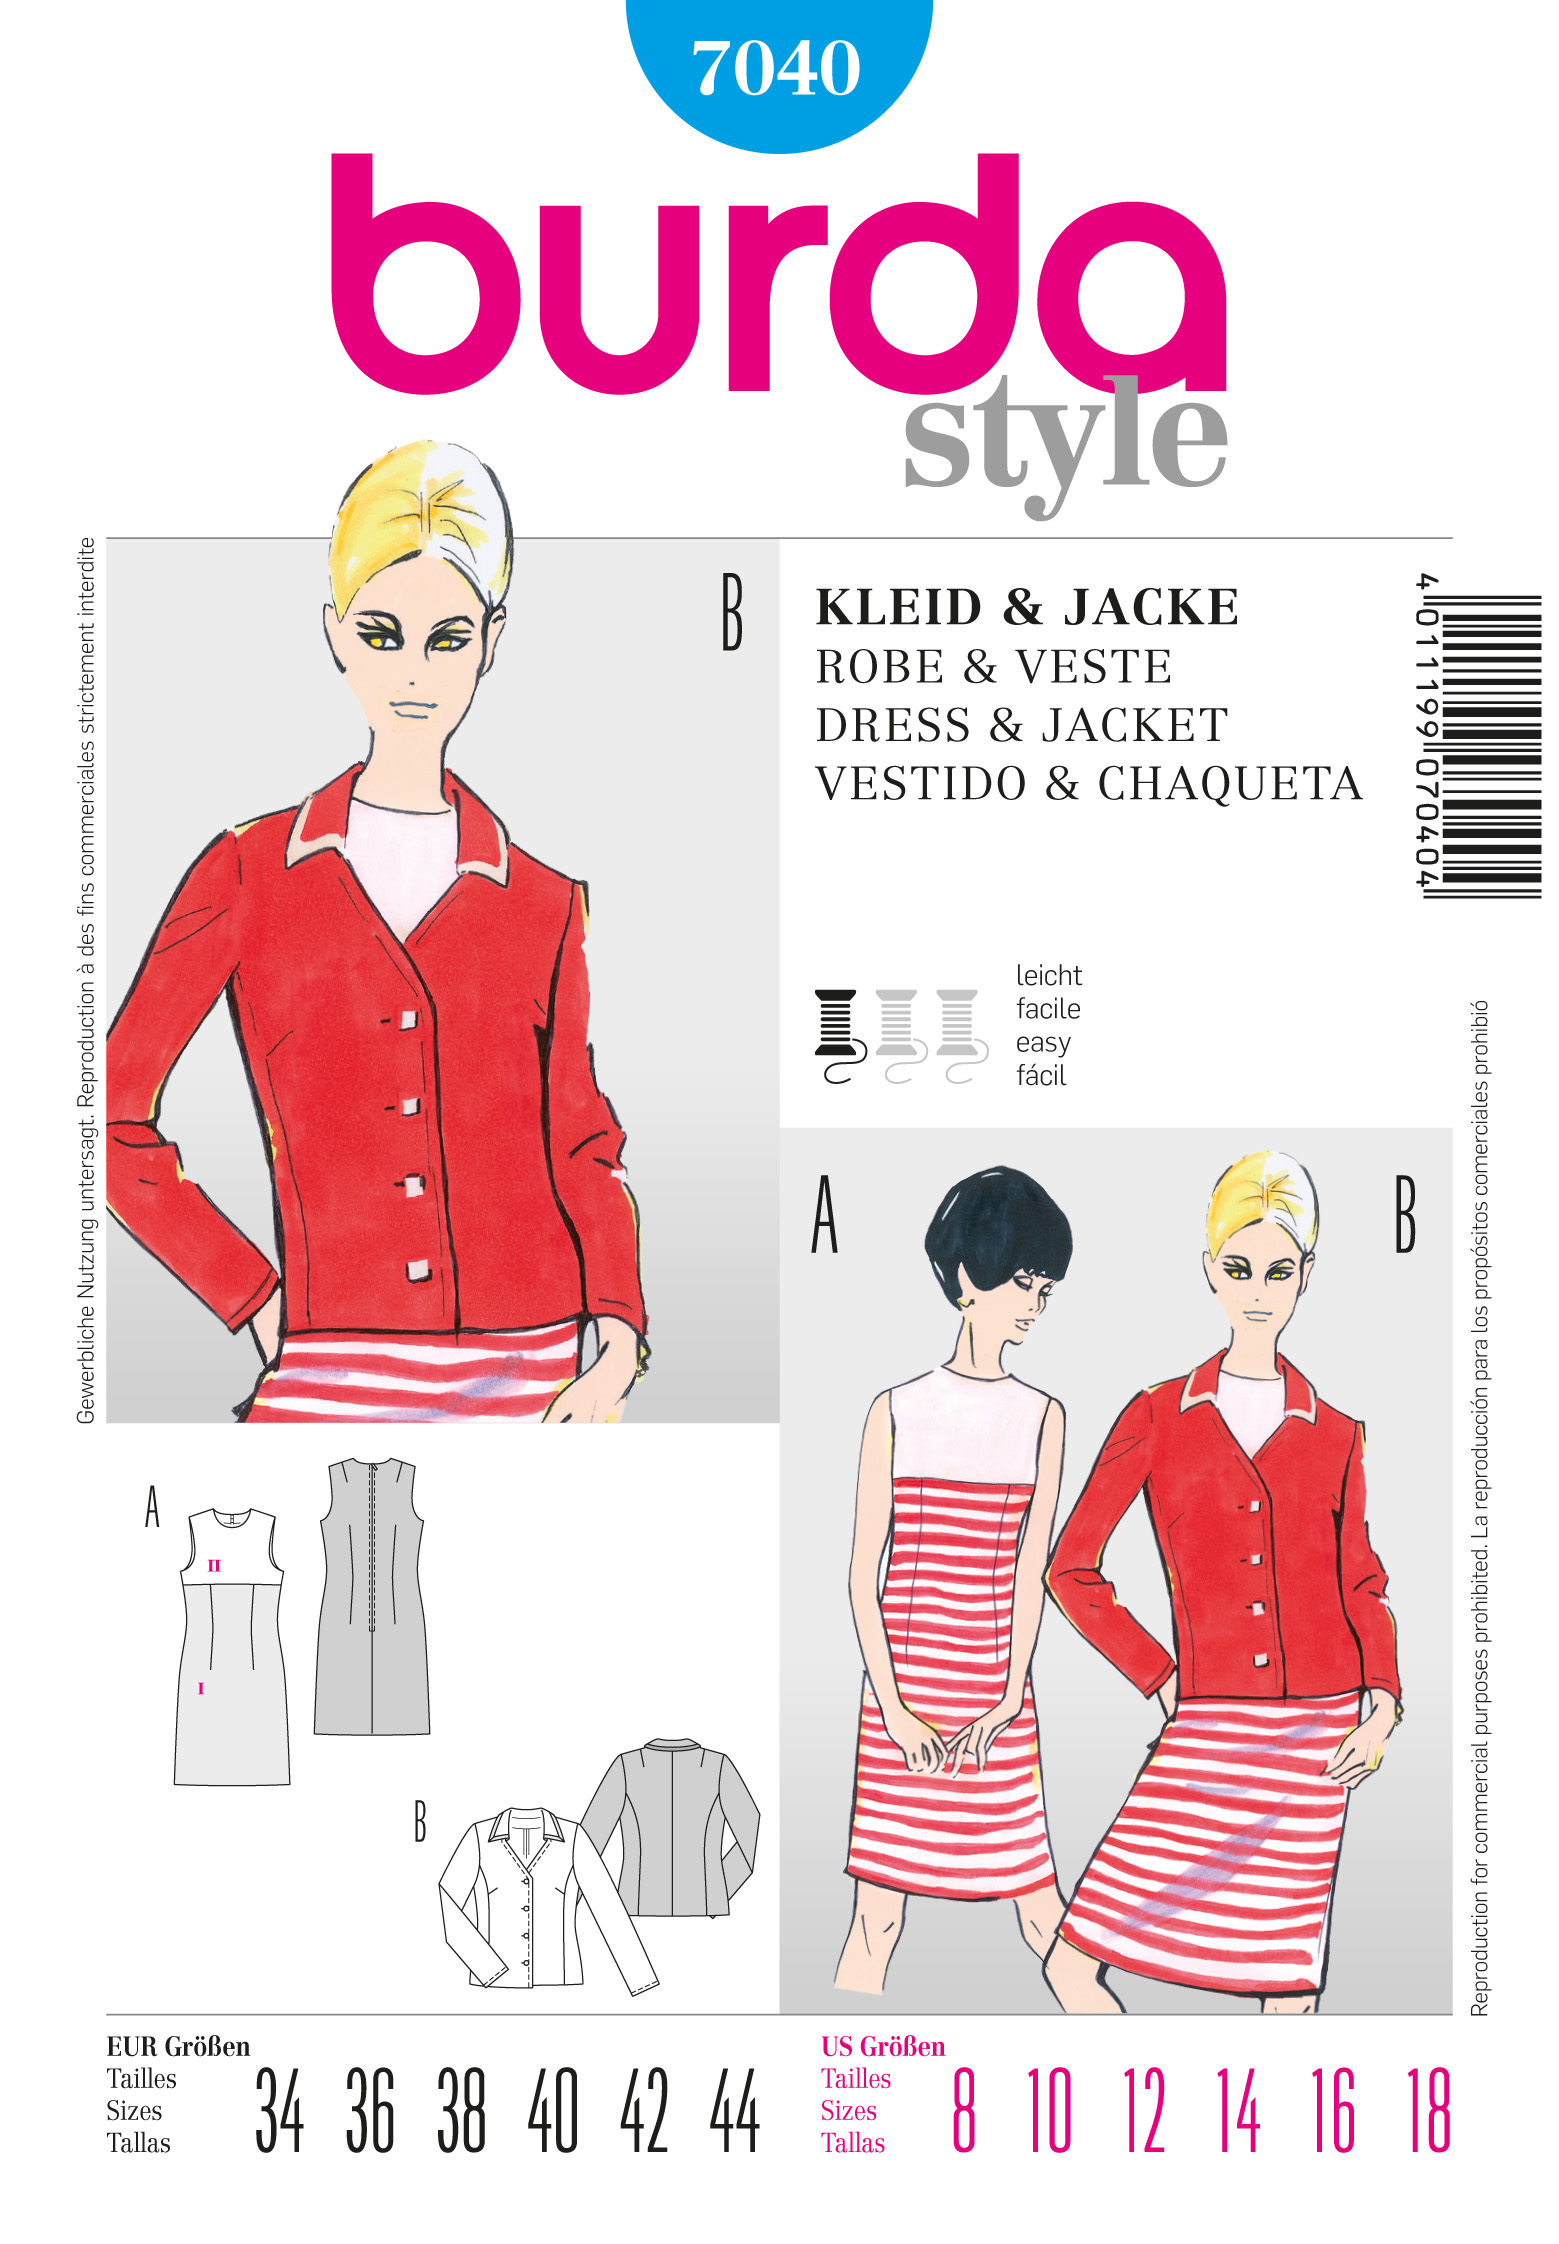 Burda Vintage Dress and Jacket 7040